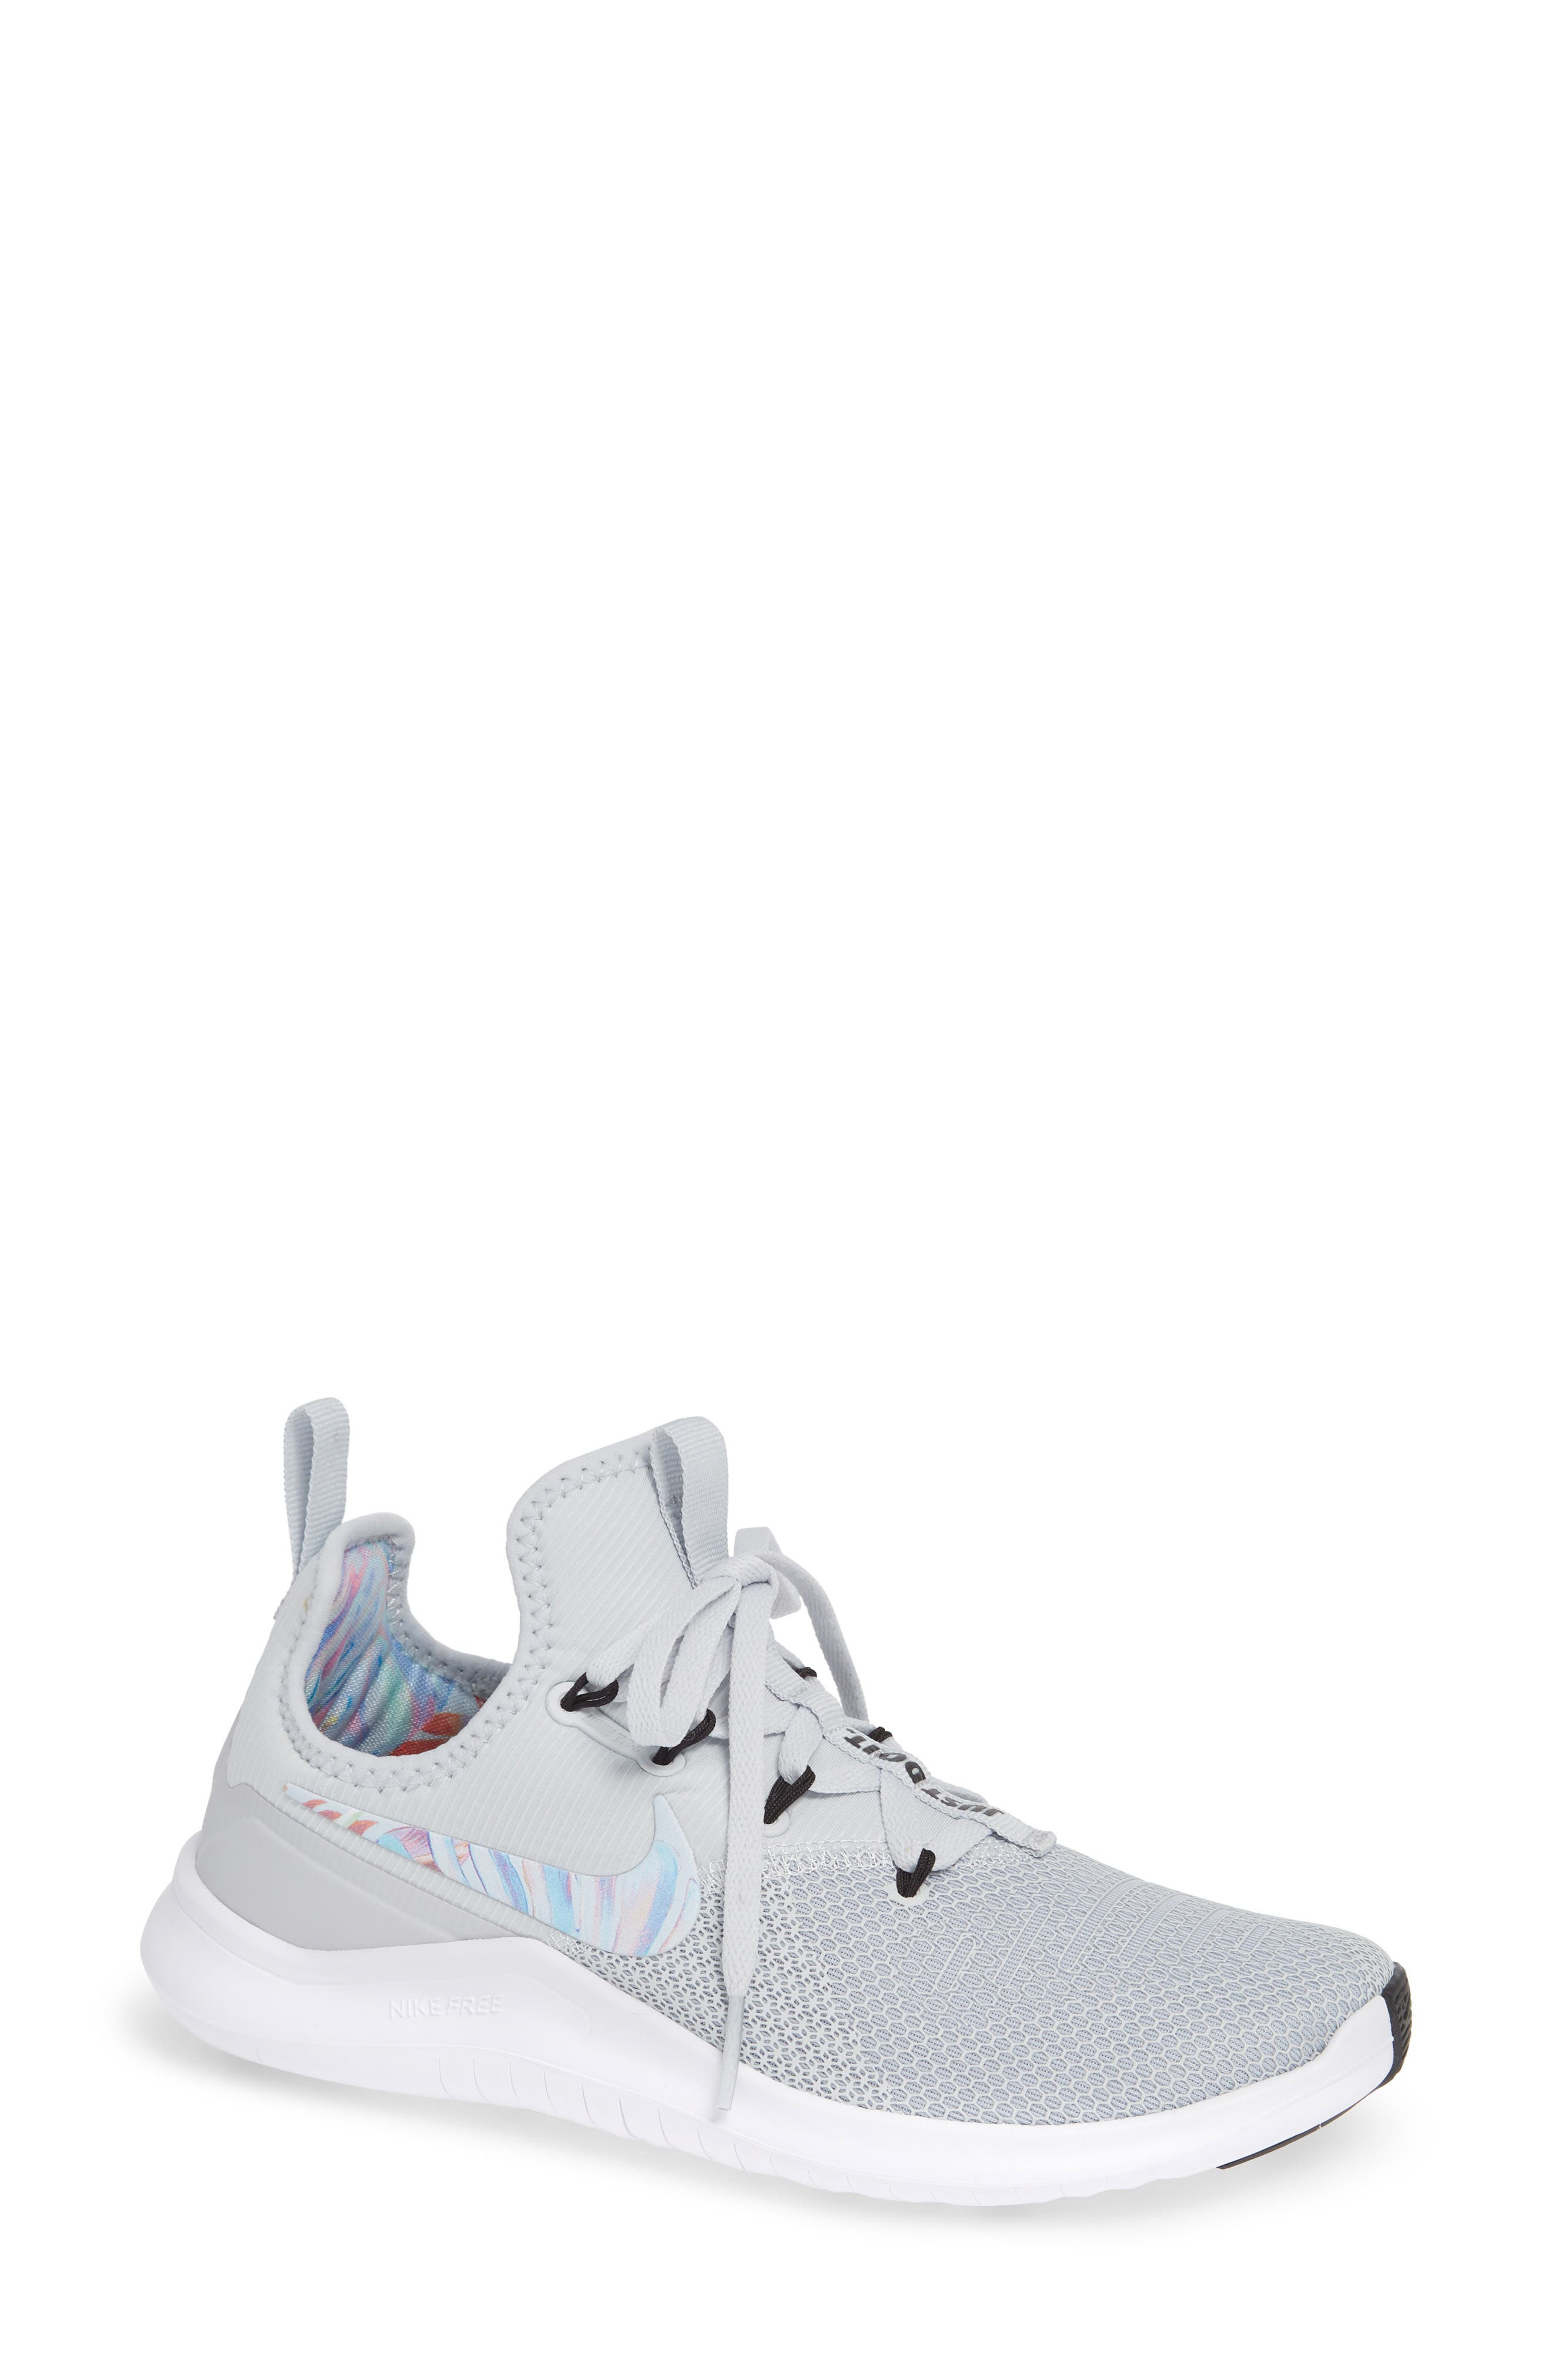 NIKE Free TR8 Training Shoe, Main, color, 025